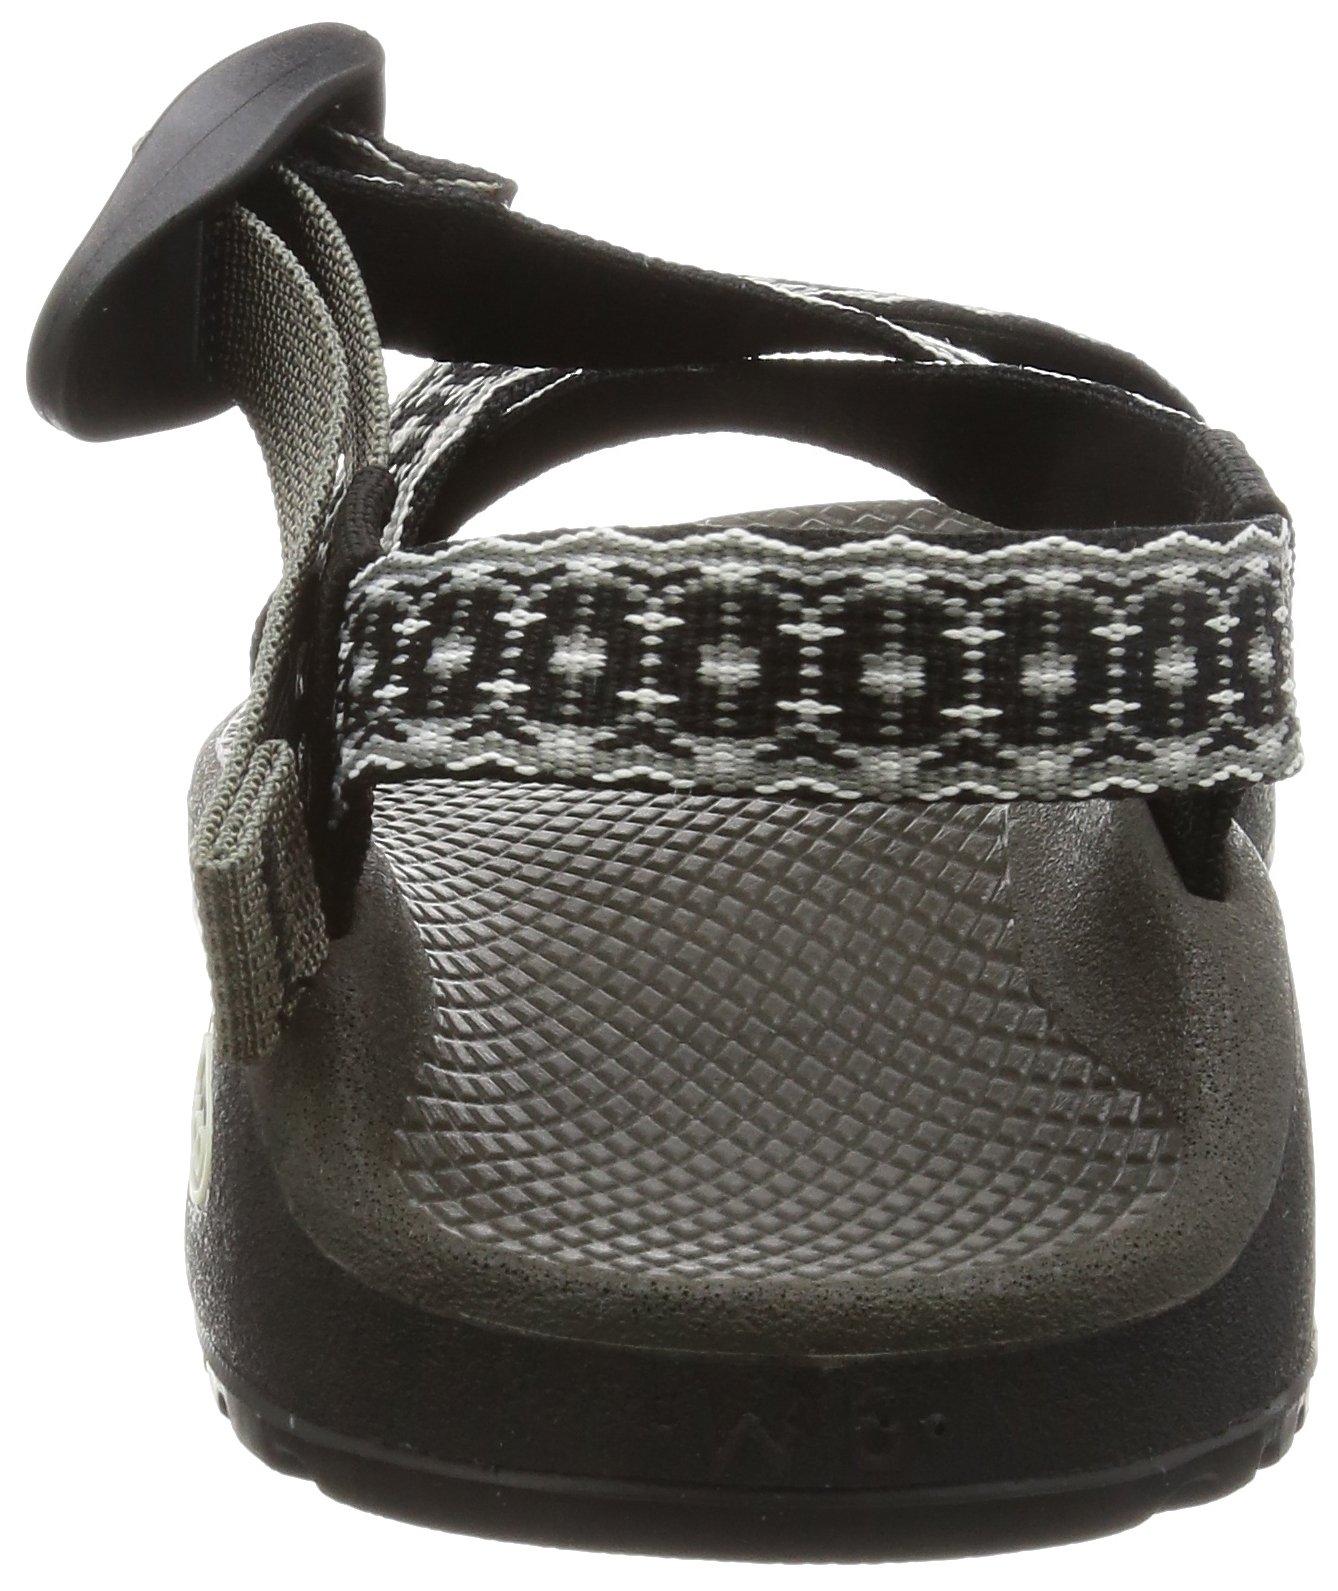 Chaco Women's Zcloud Sport Sandal, Venetian Black, 9 M US by Chaco (Image #2)